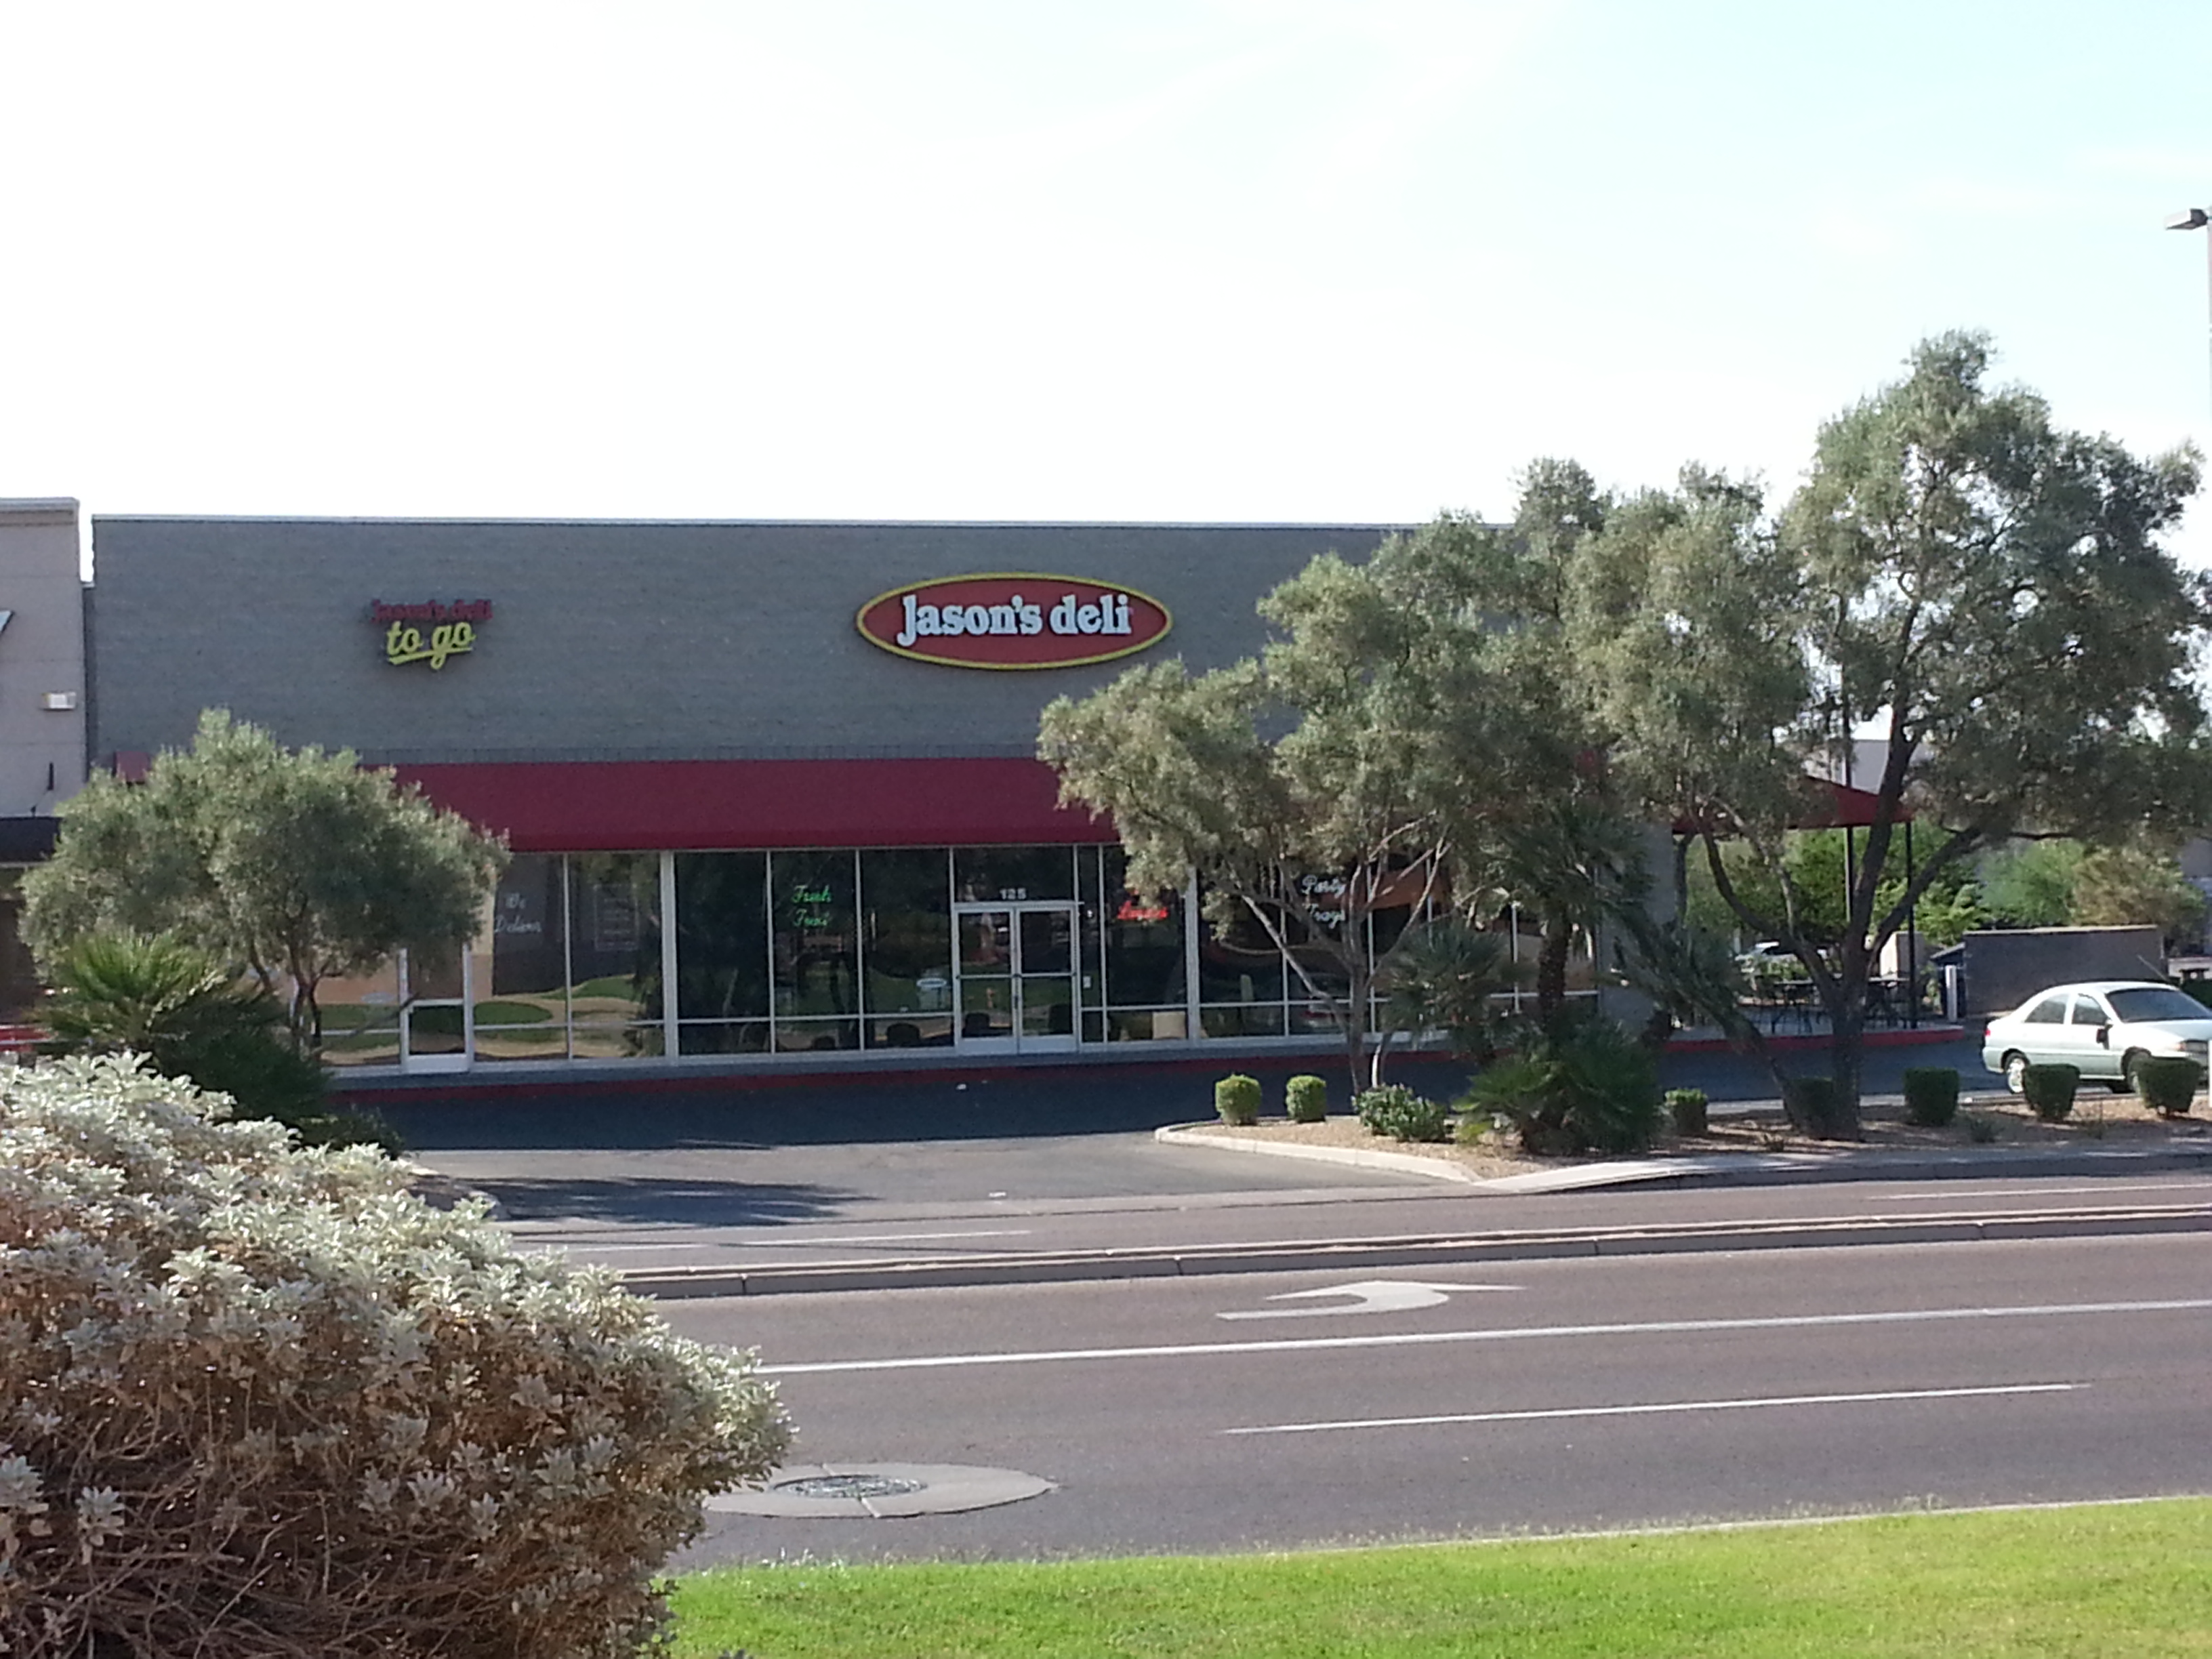 Jason's Deli in Phoenix, AZ